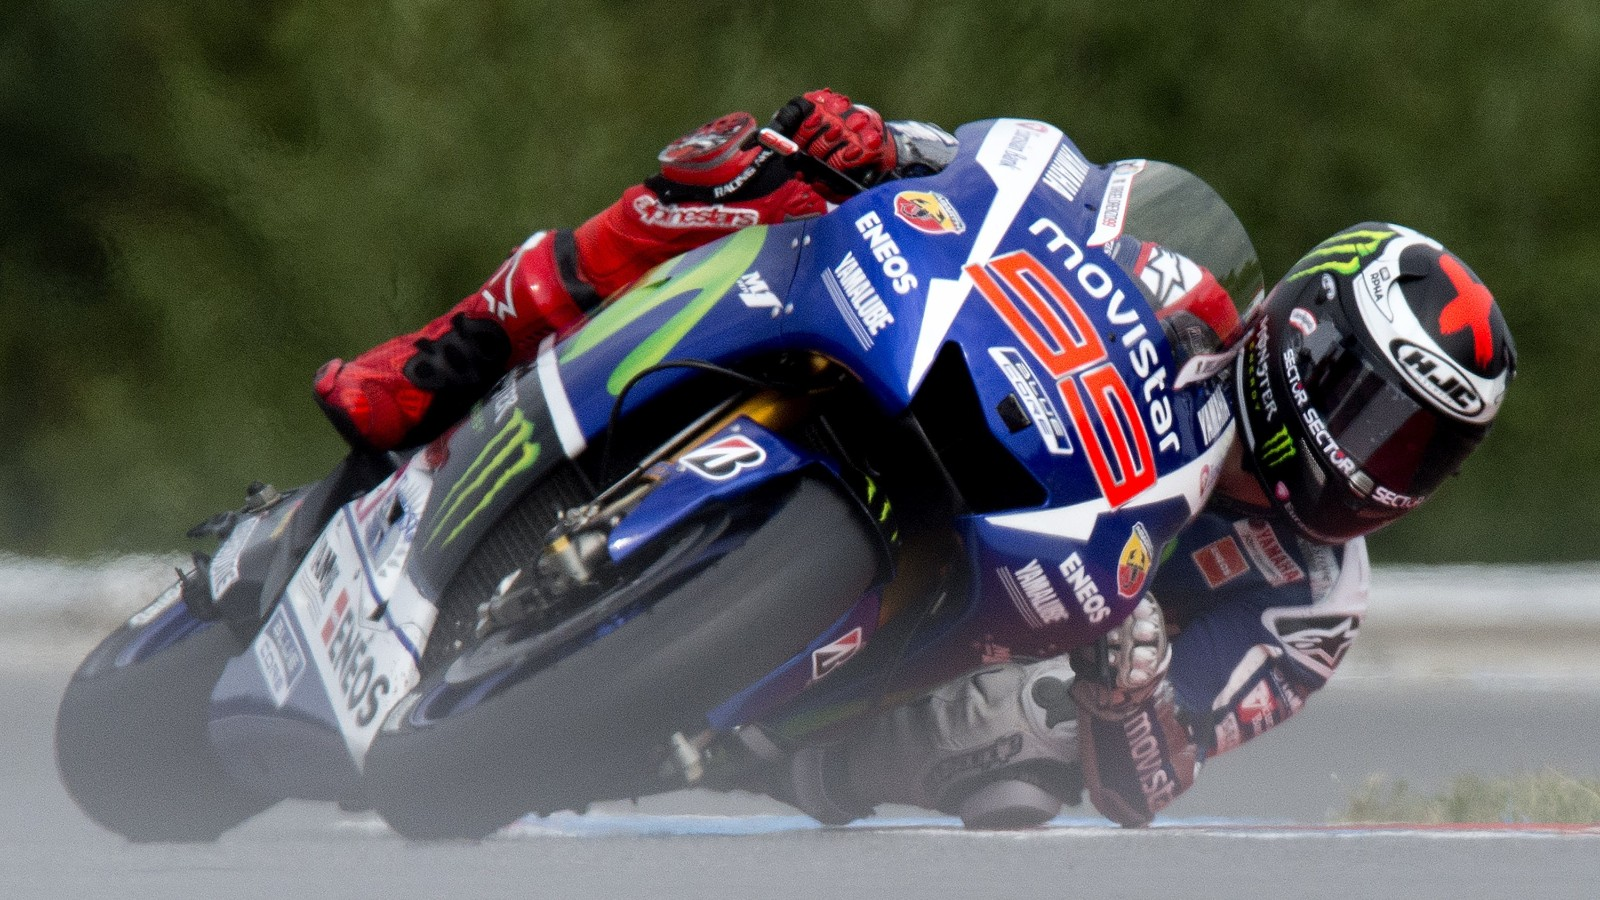 Moto GP: Jorge Lorenzo smashes Brno record, claims pole - CNN